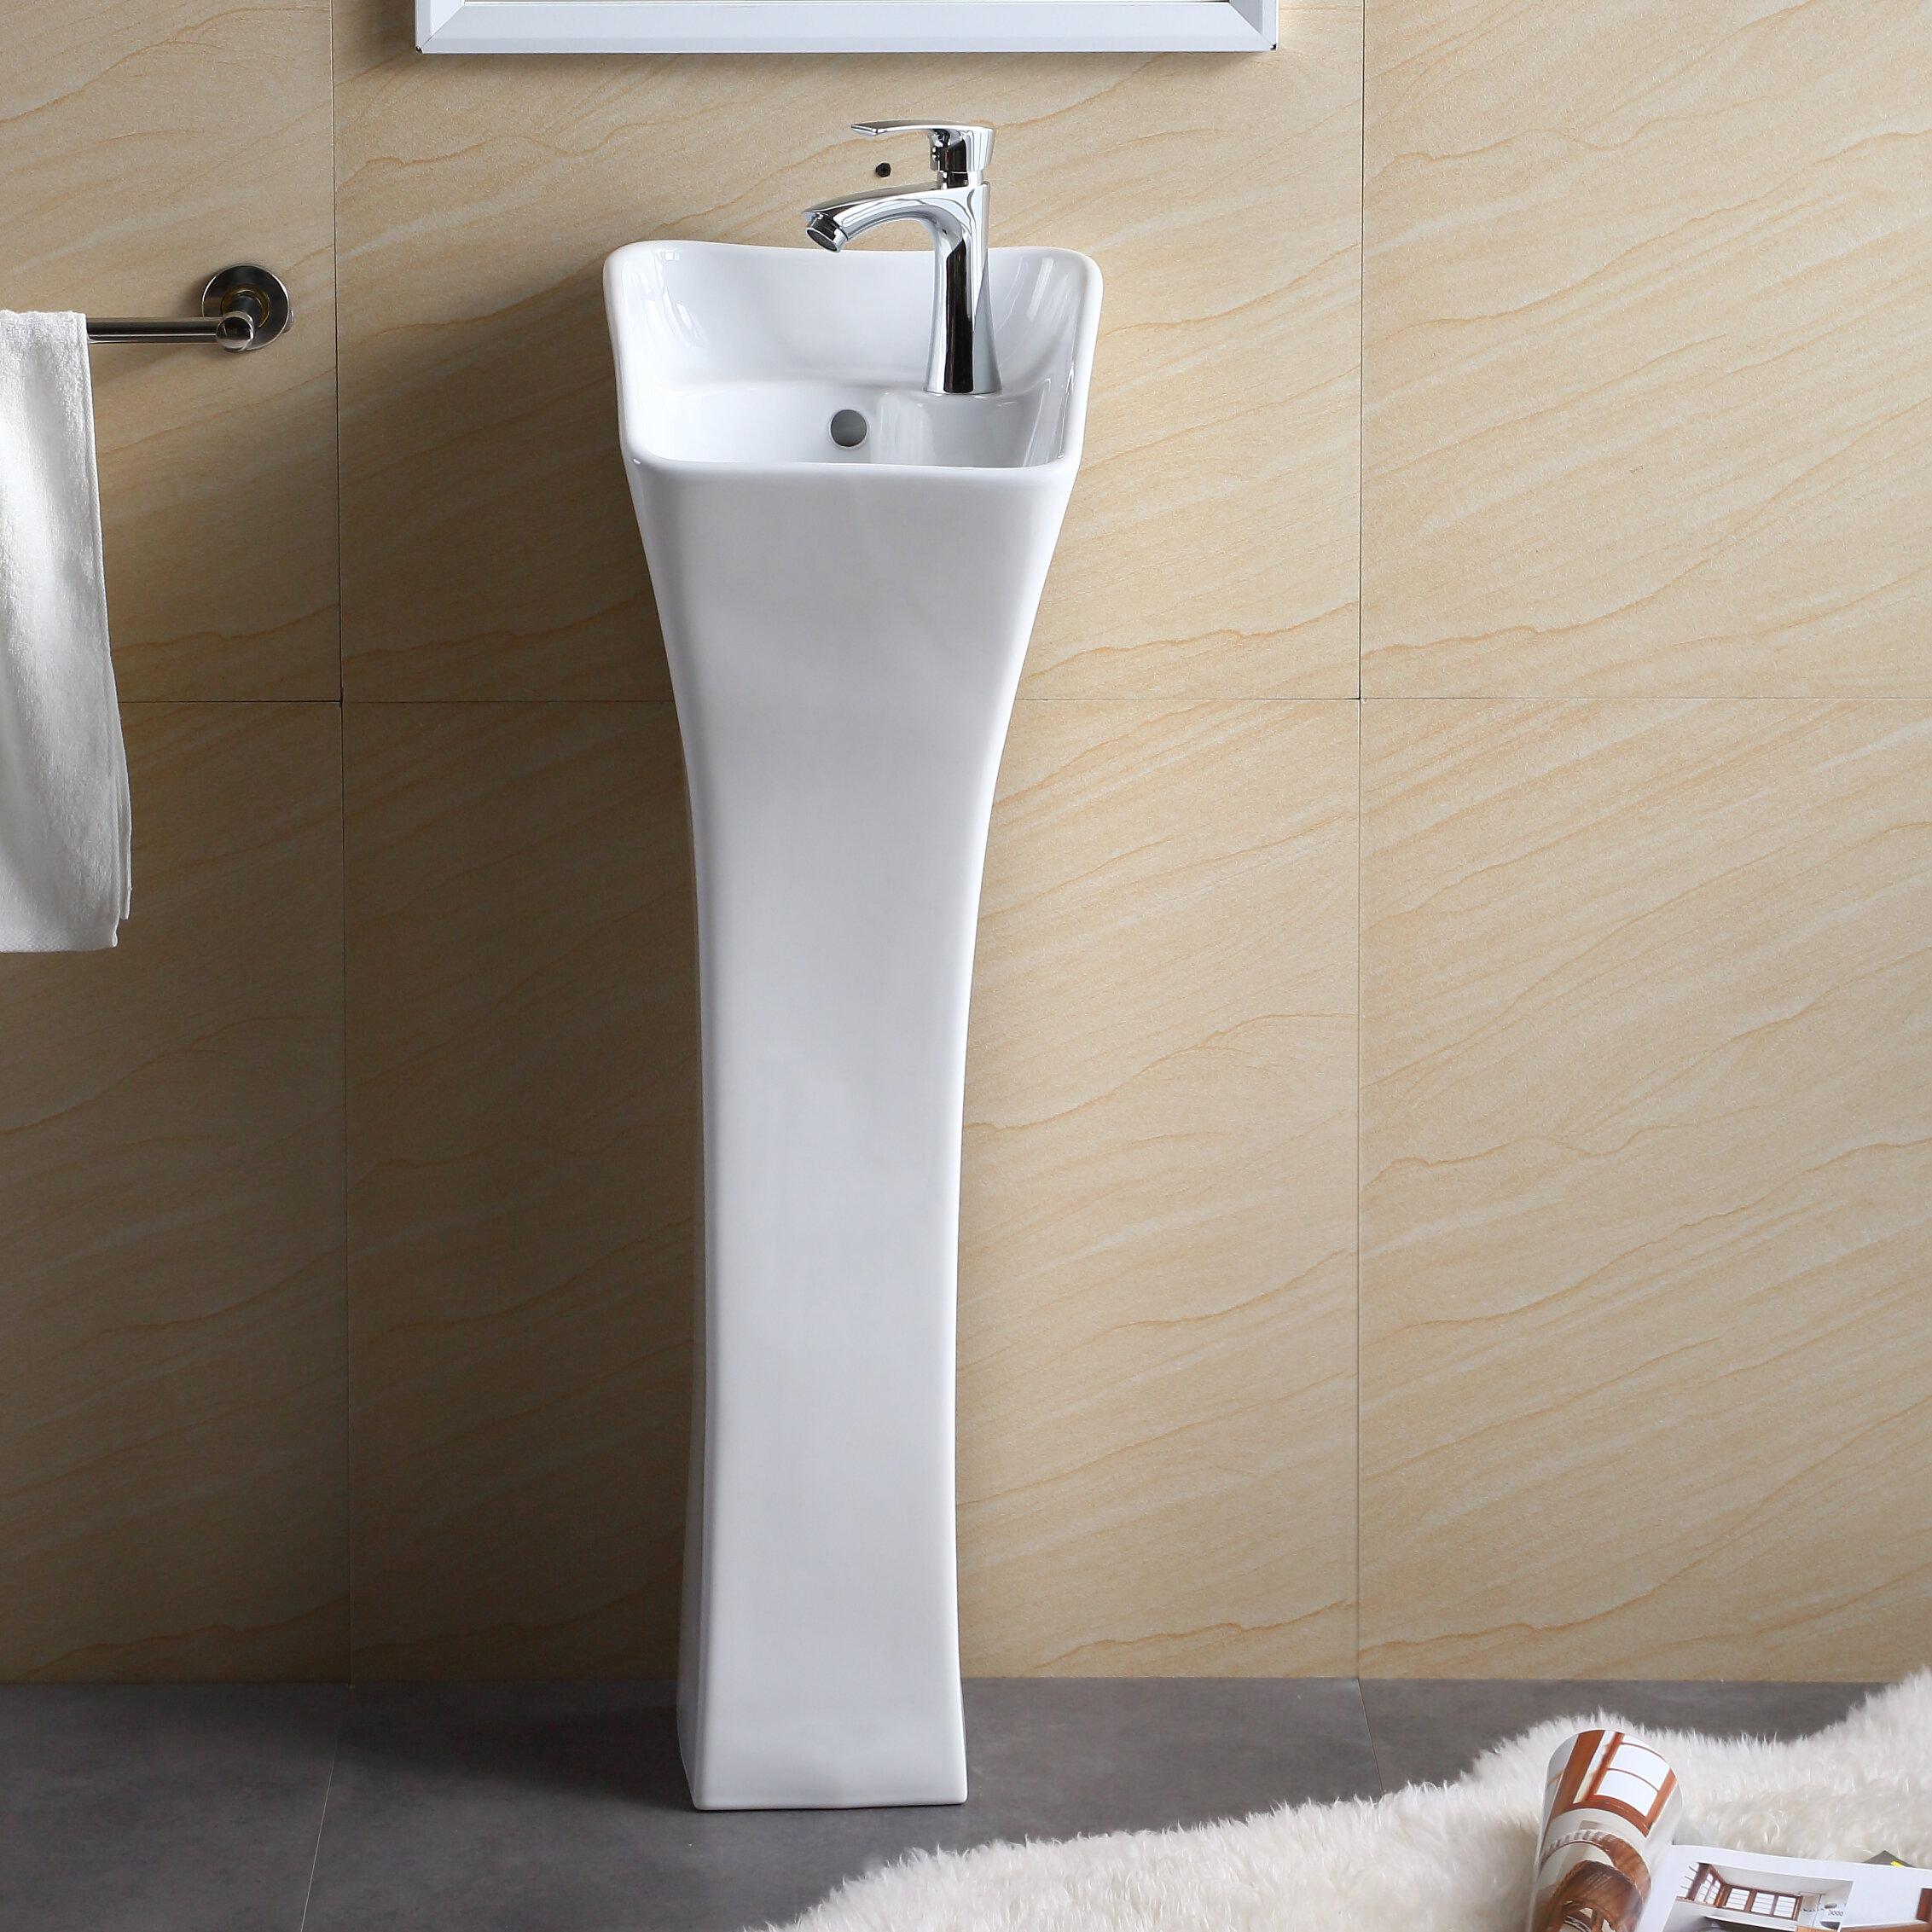 Fine Fixtures 34 25 Tall Vitreous China Rectangular Pedestal Bathroom Sink With Overflow Reviews Wayfair